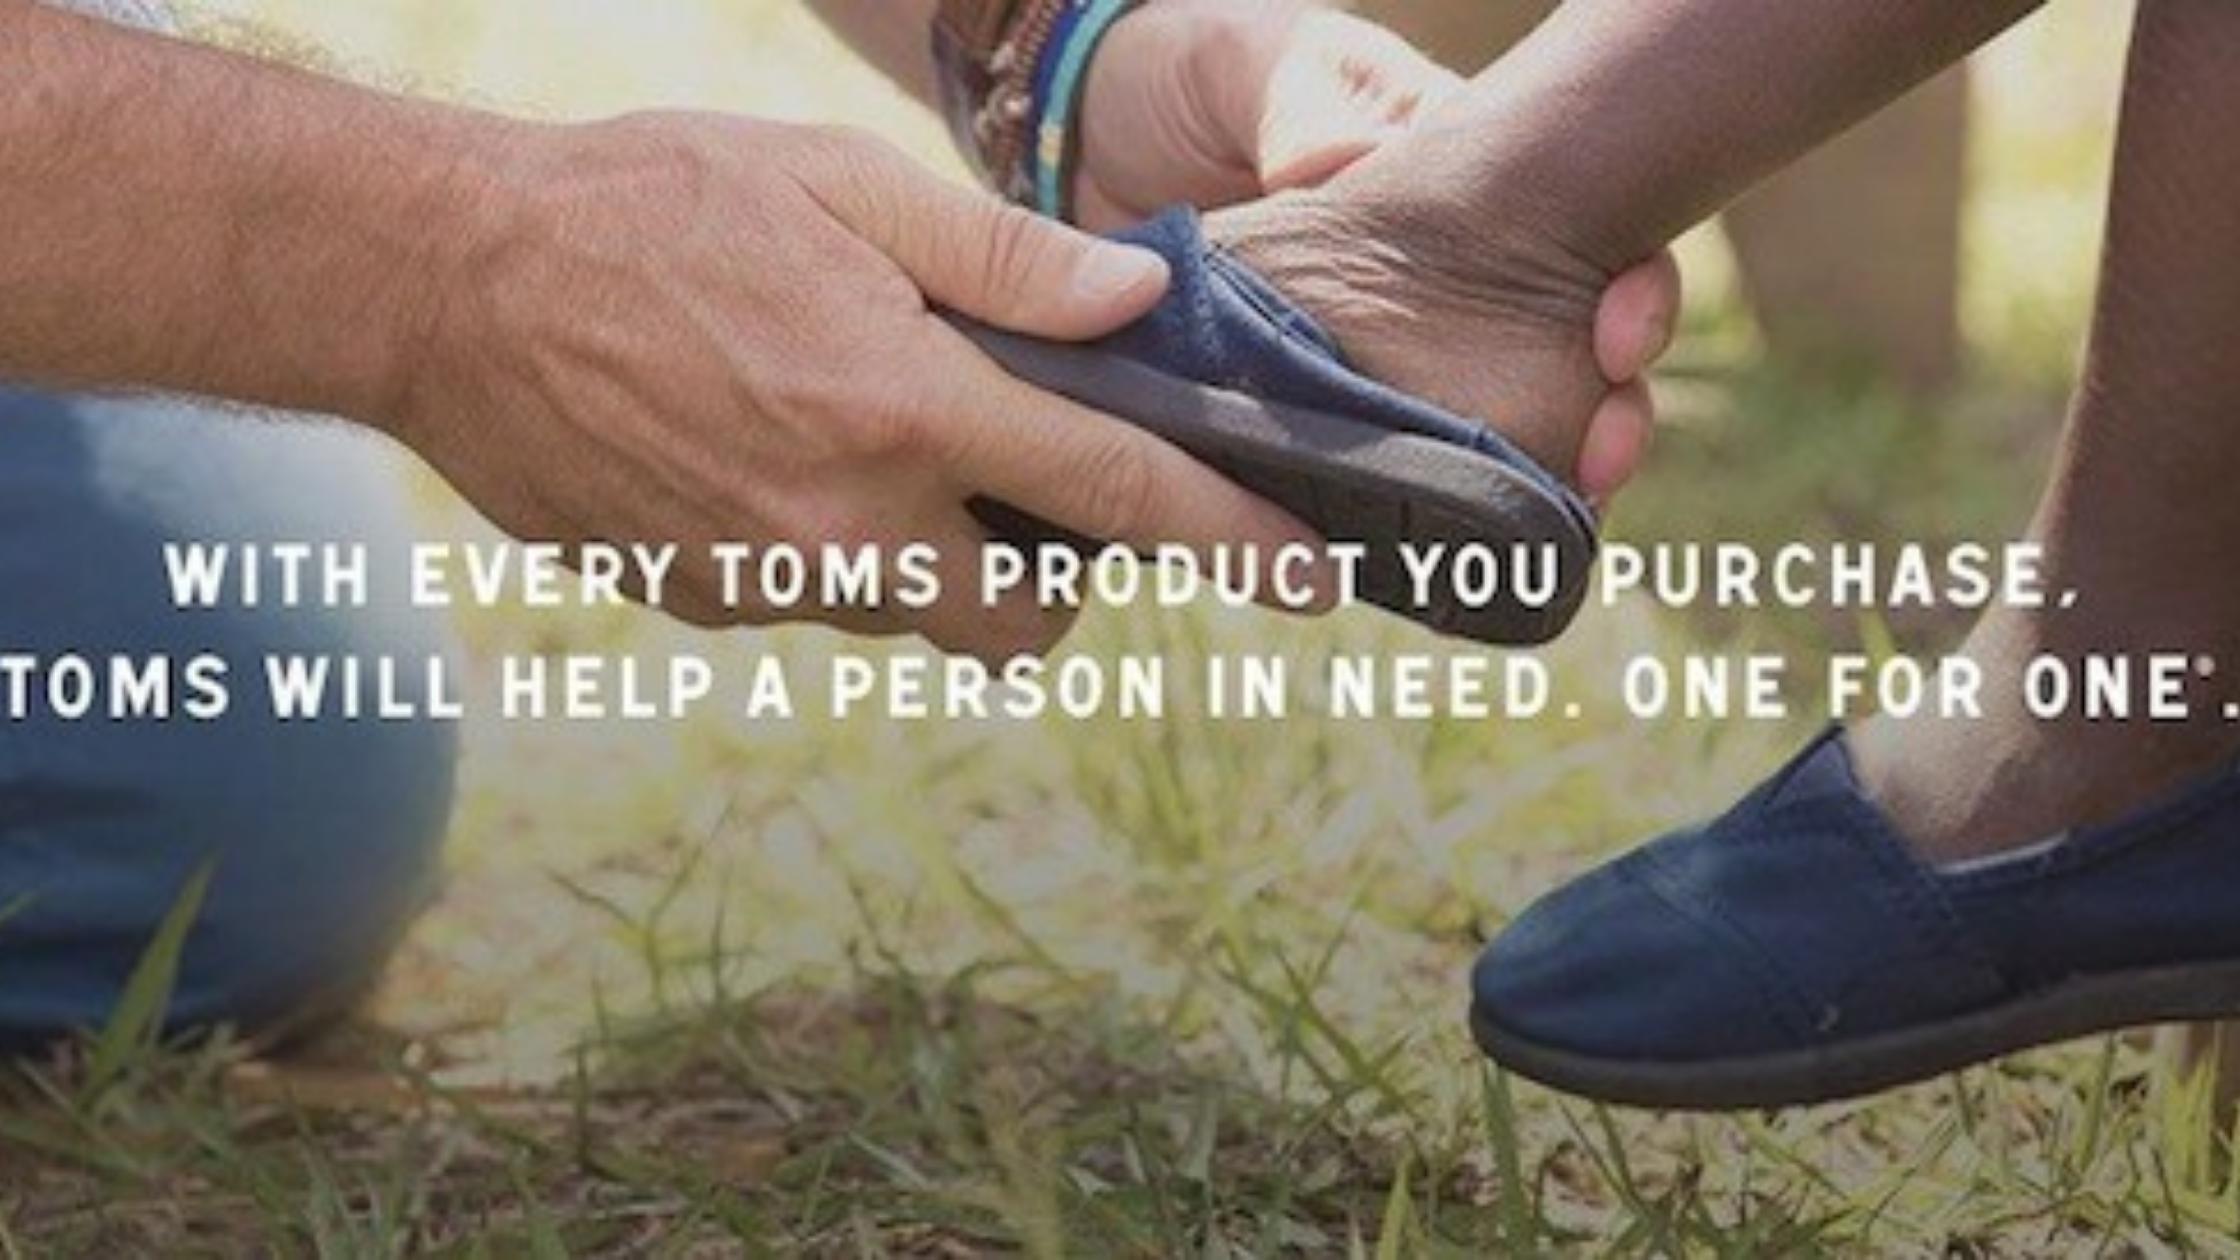 Toms USP as their business purpose